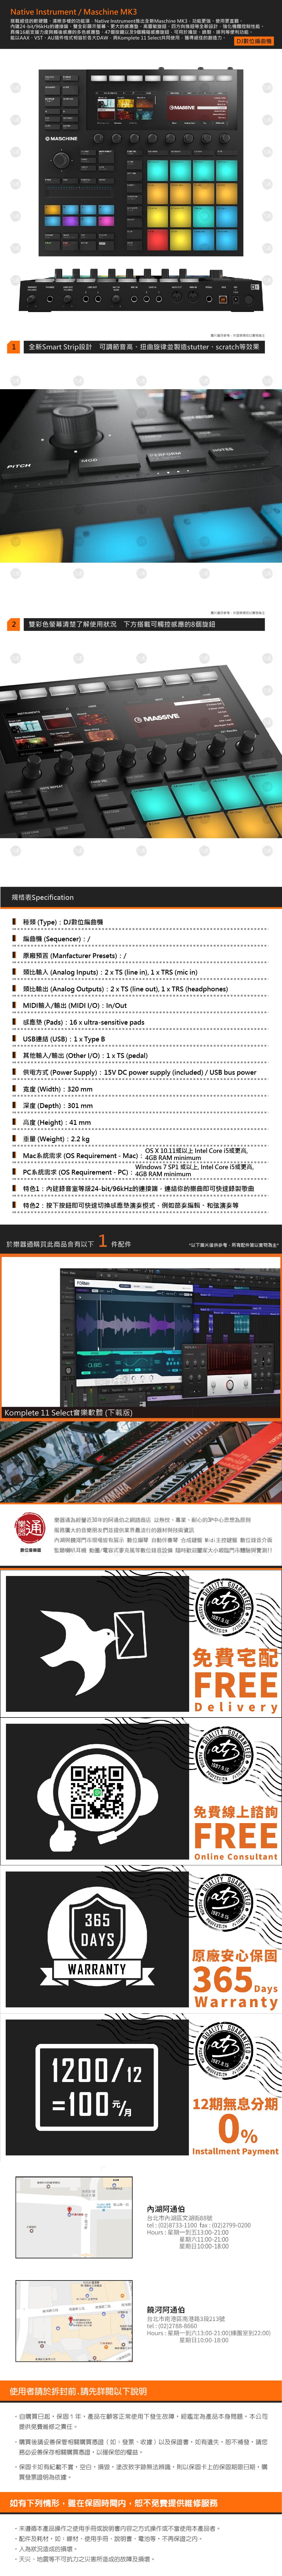 20180914_Native Instrument_Maschine mk3